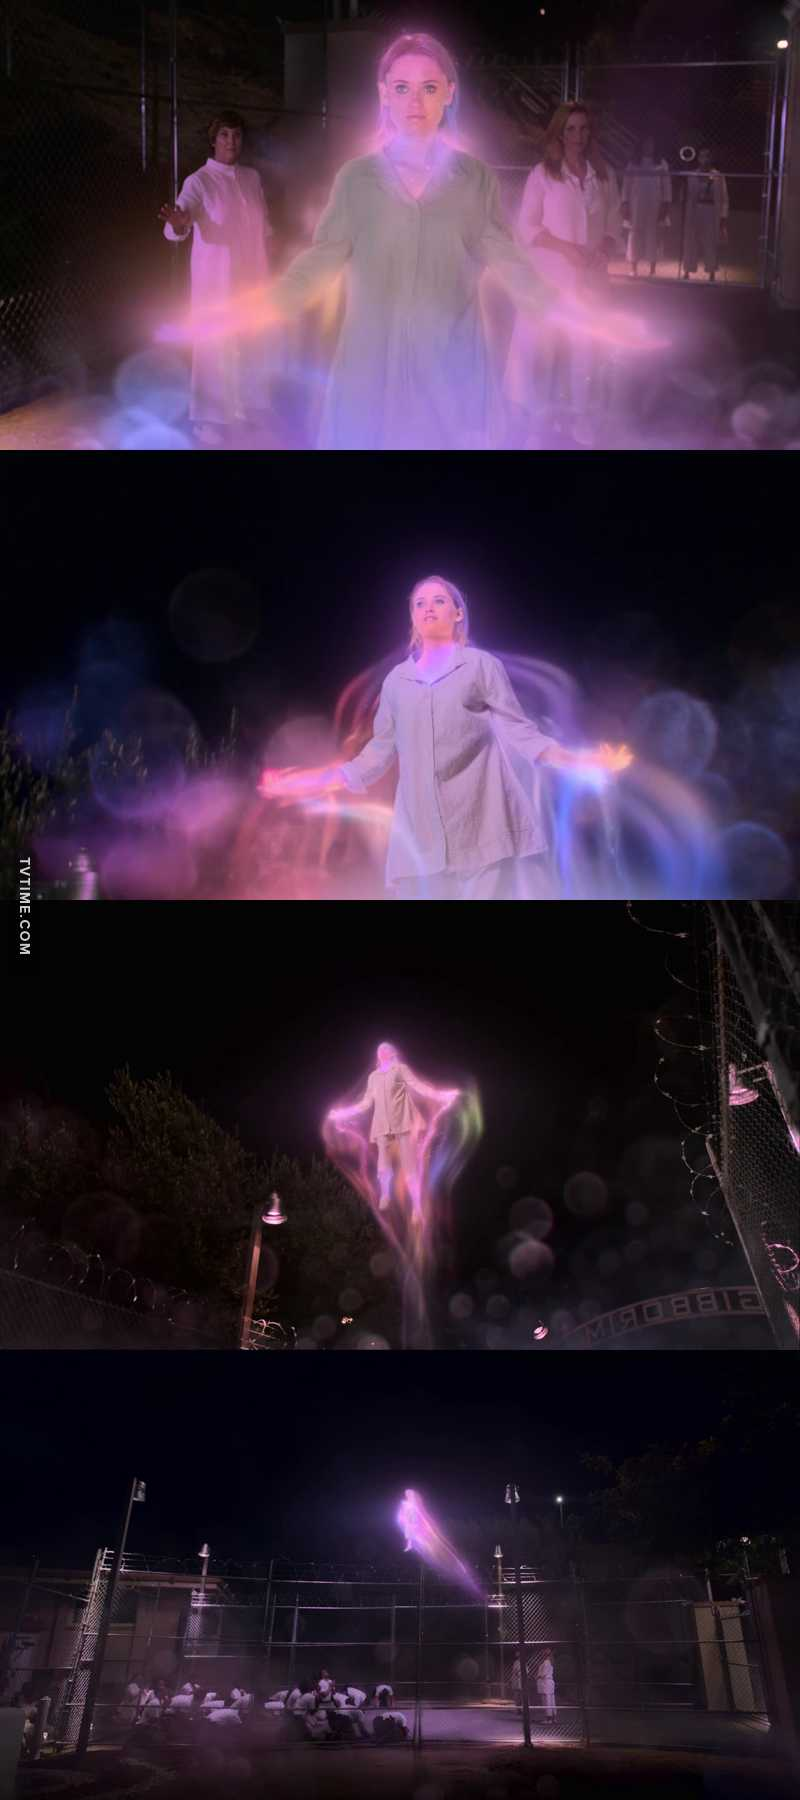 Lesbian Jesus has risen